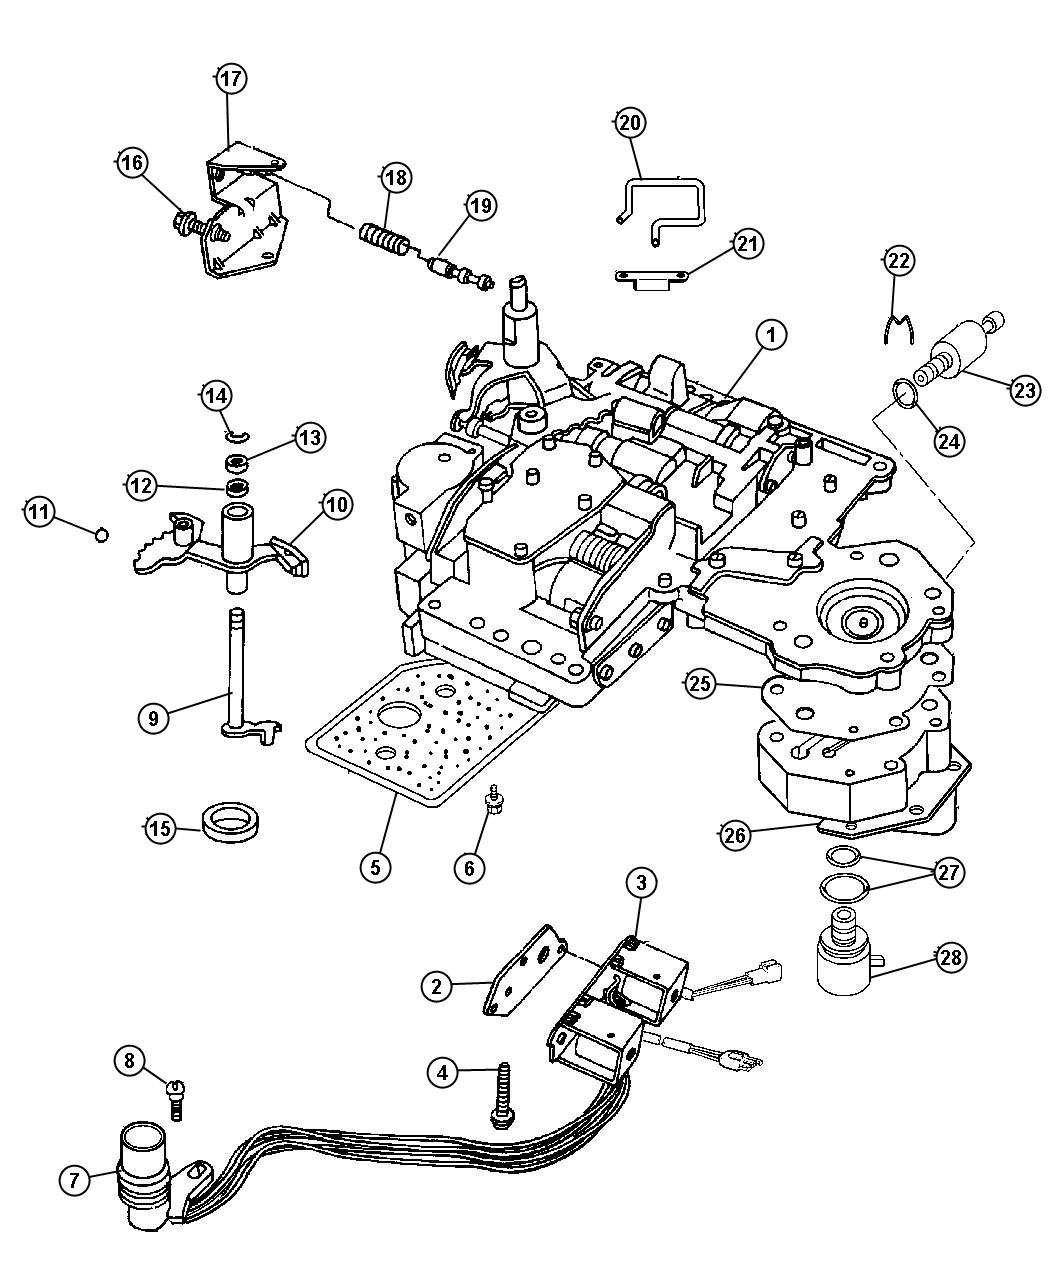 Dodge Durango Solenoid. Transmission overdrive. Prong